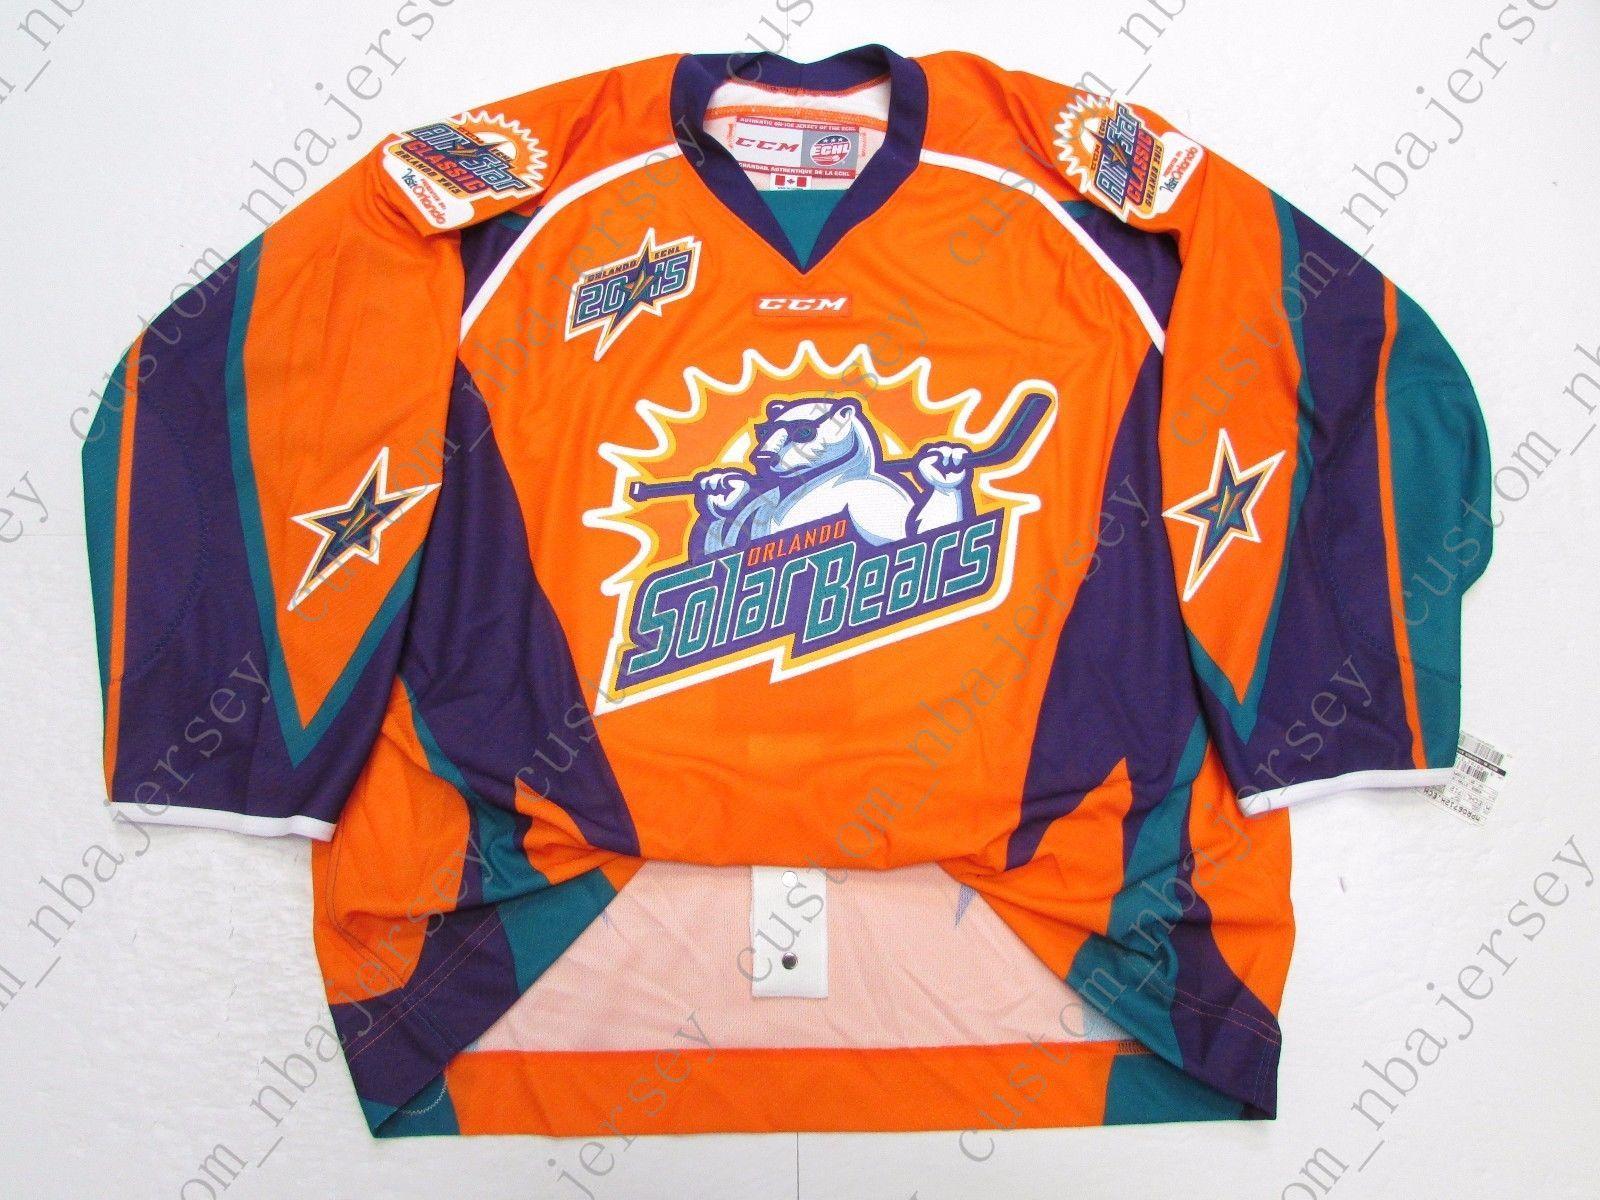 809b58344814 2019 Cheap Custom 2015 ECHL ALL STAR GAME ORLANDO SOLAR BEARS CCM JERSEY  Stitch Add Any Number Any Name Mens Hockey Jersey XS 5XL From  Custom nbajersey